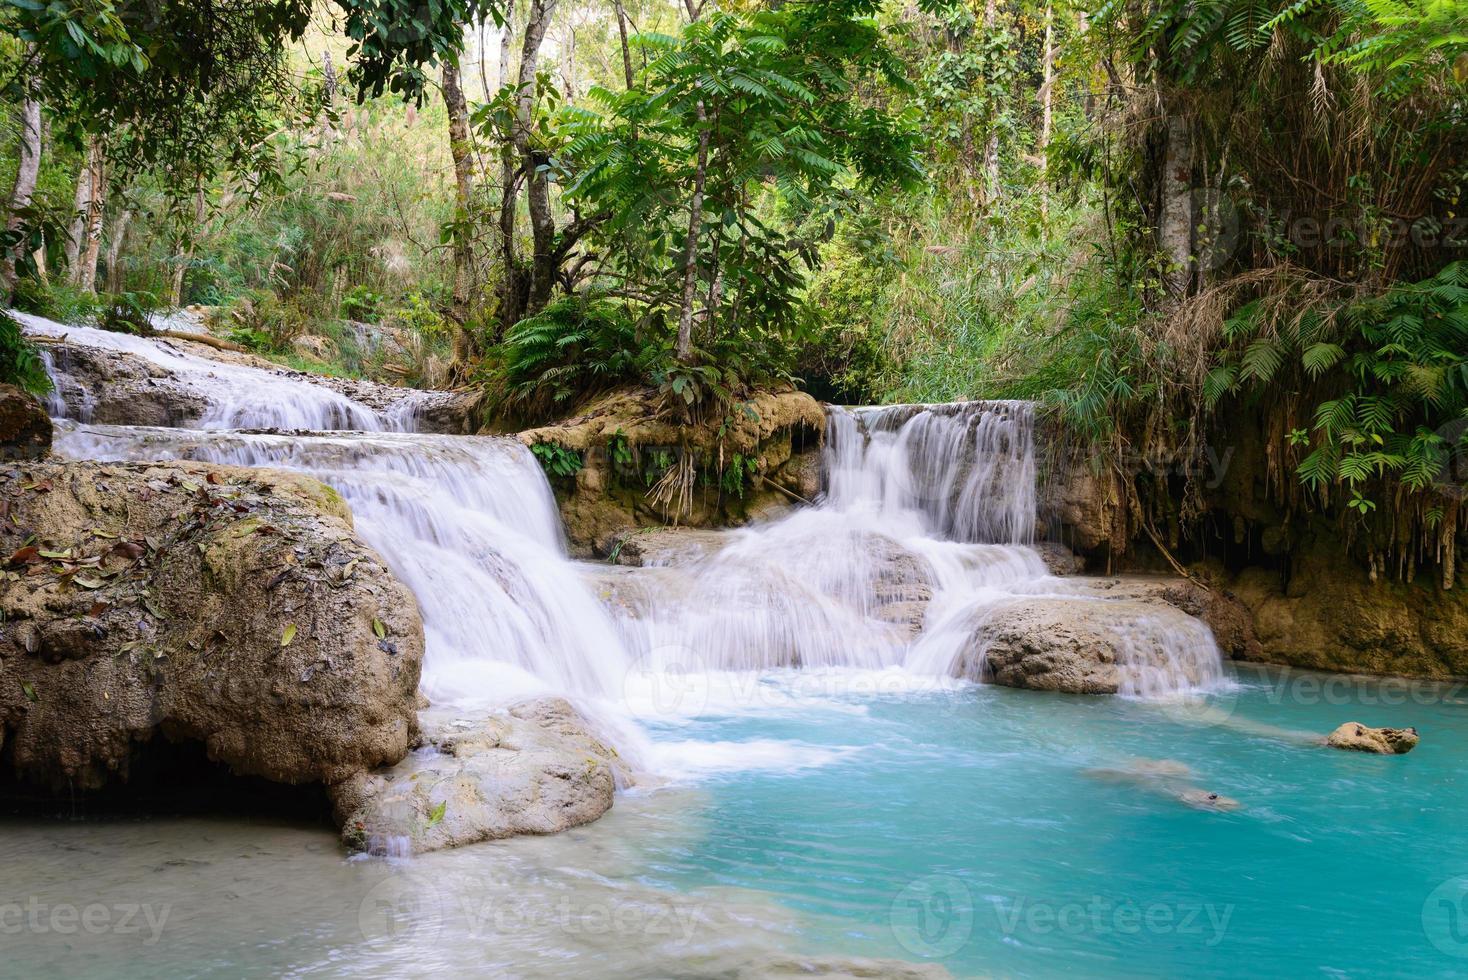 kouangxi vattenfall vid luang prabang i laos. foto